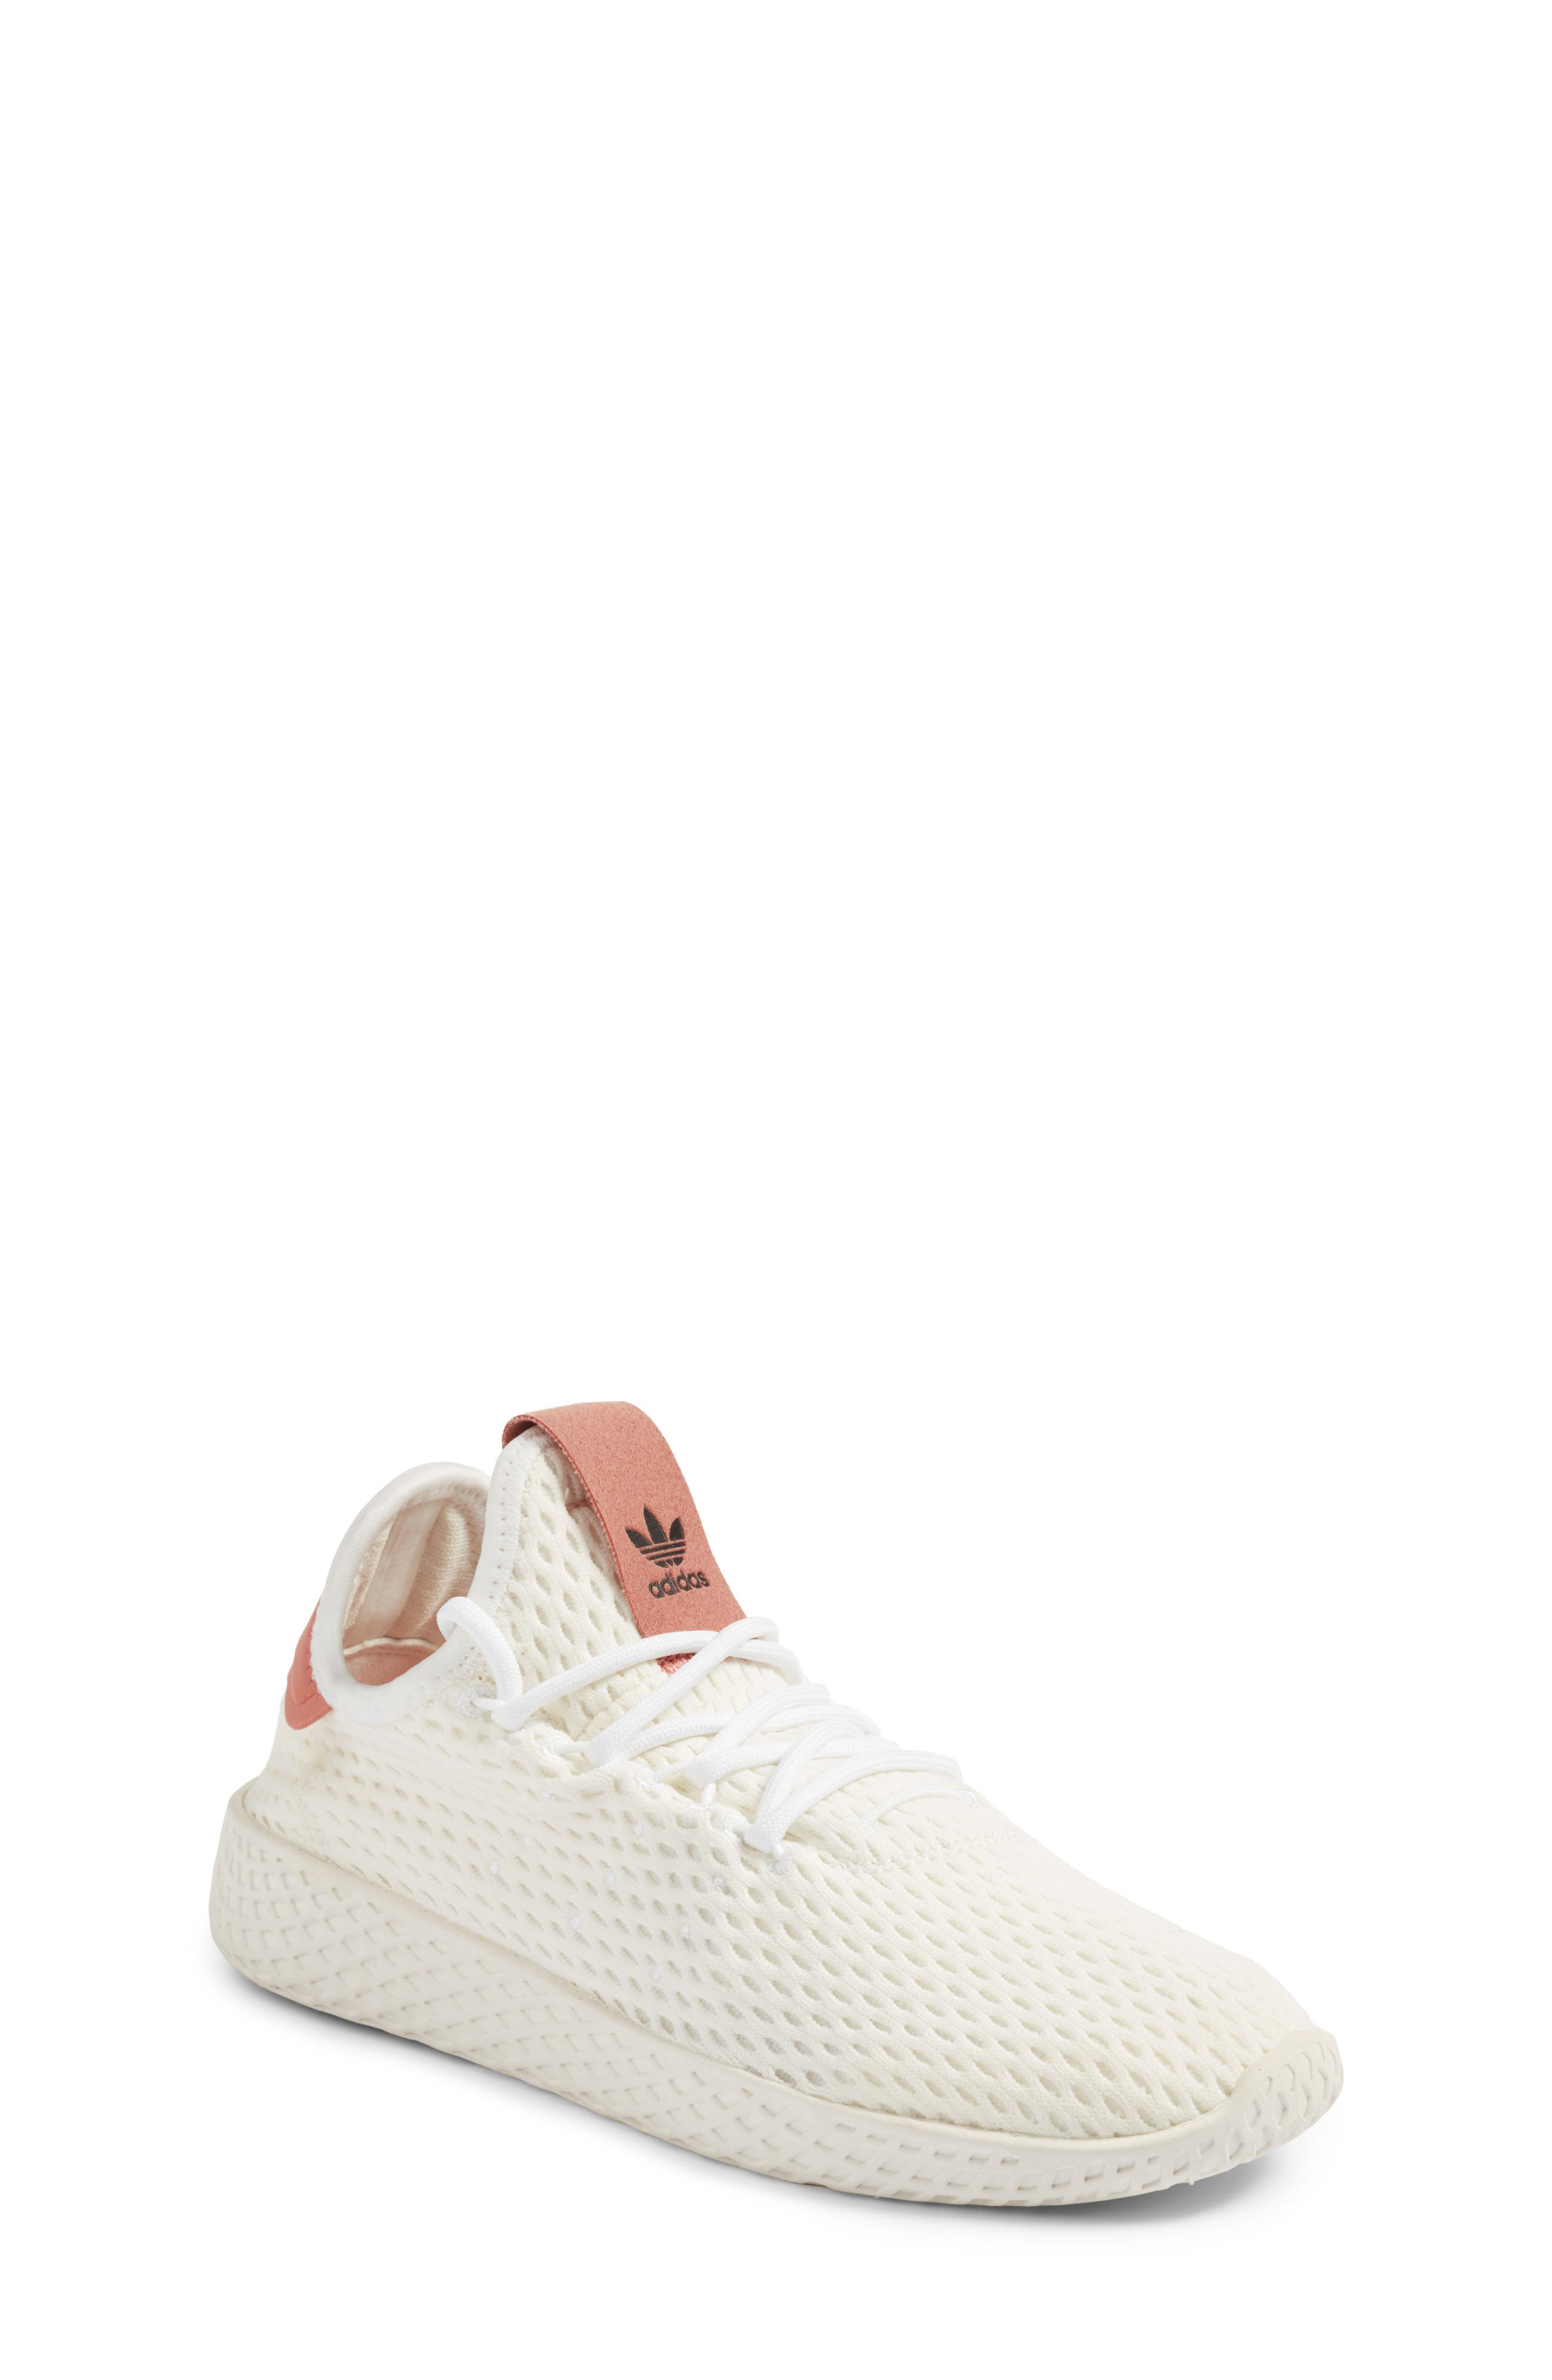 Originals x Pharrell Williams The Summers Mesh Sneaker,                         Main,                         color,